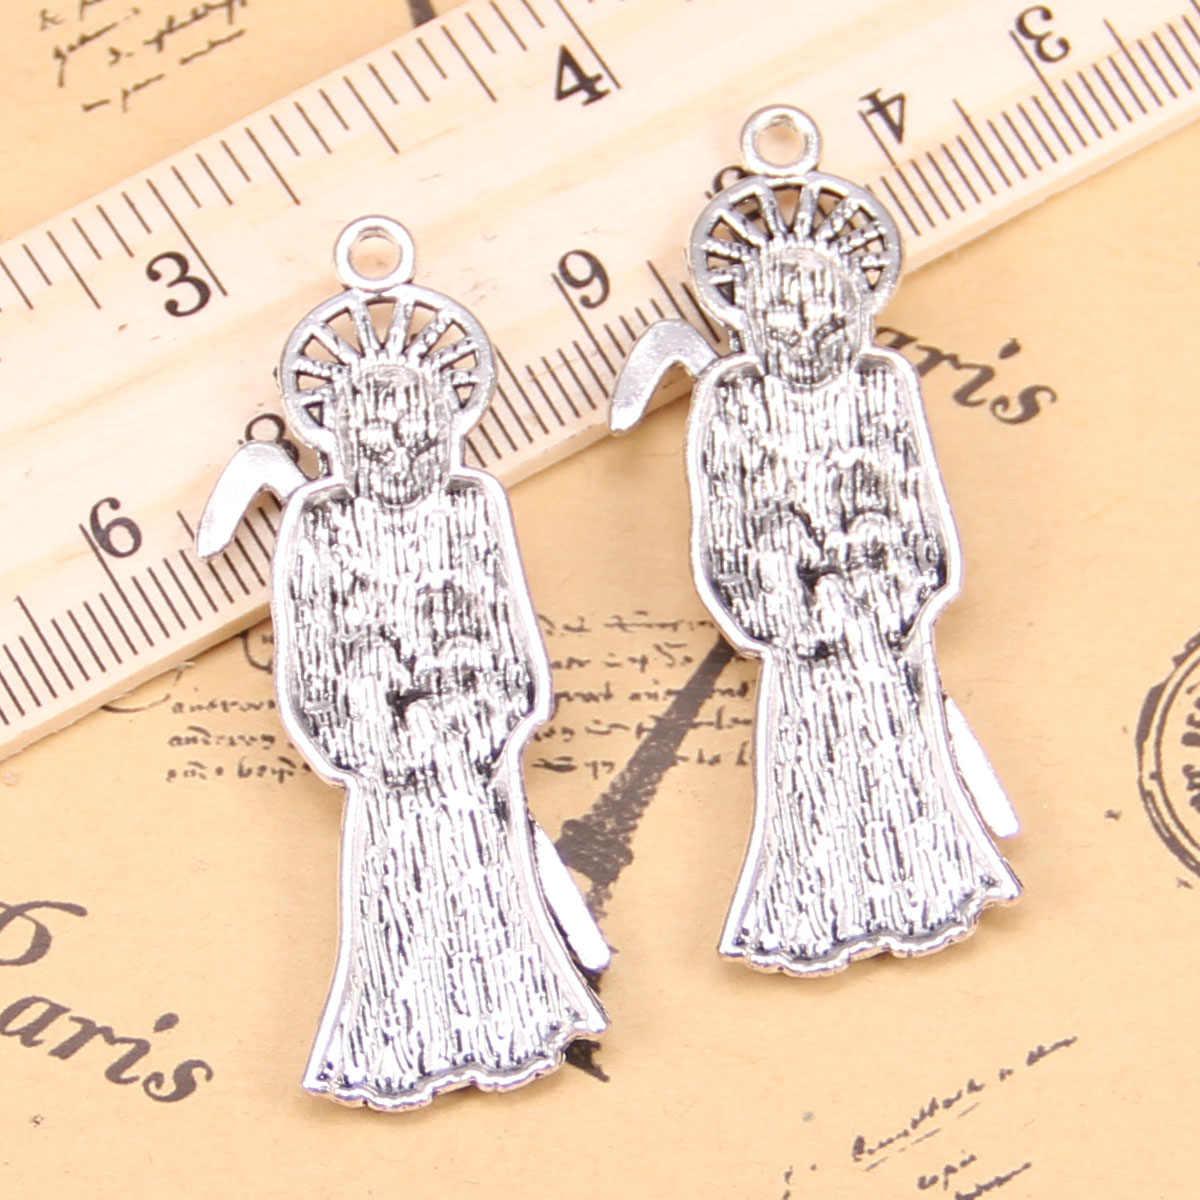 3pcs Charms For Jewelry Making grim reaper death 51x19mm Antique Silver Plated Pendants DIY Tibetan Silver Bracelet Necklace